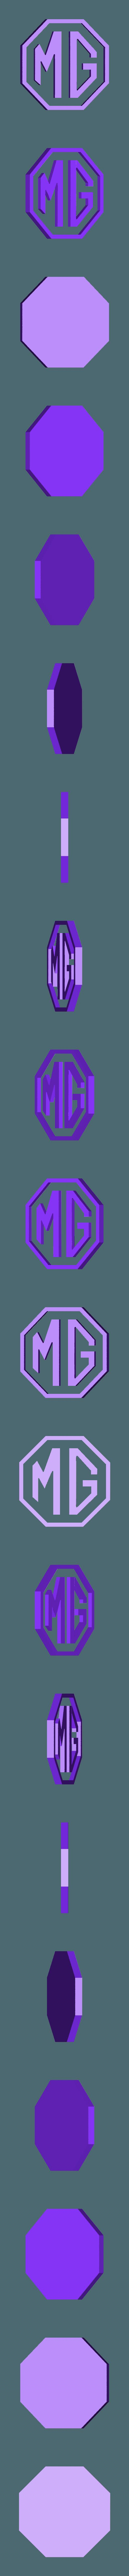 mglogo.stl Download free STL file MG Logo • 3D printer model, sui77